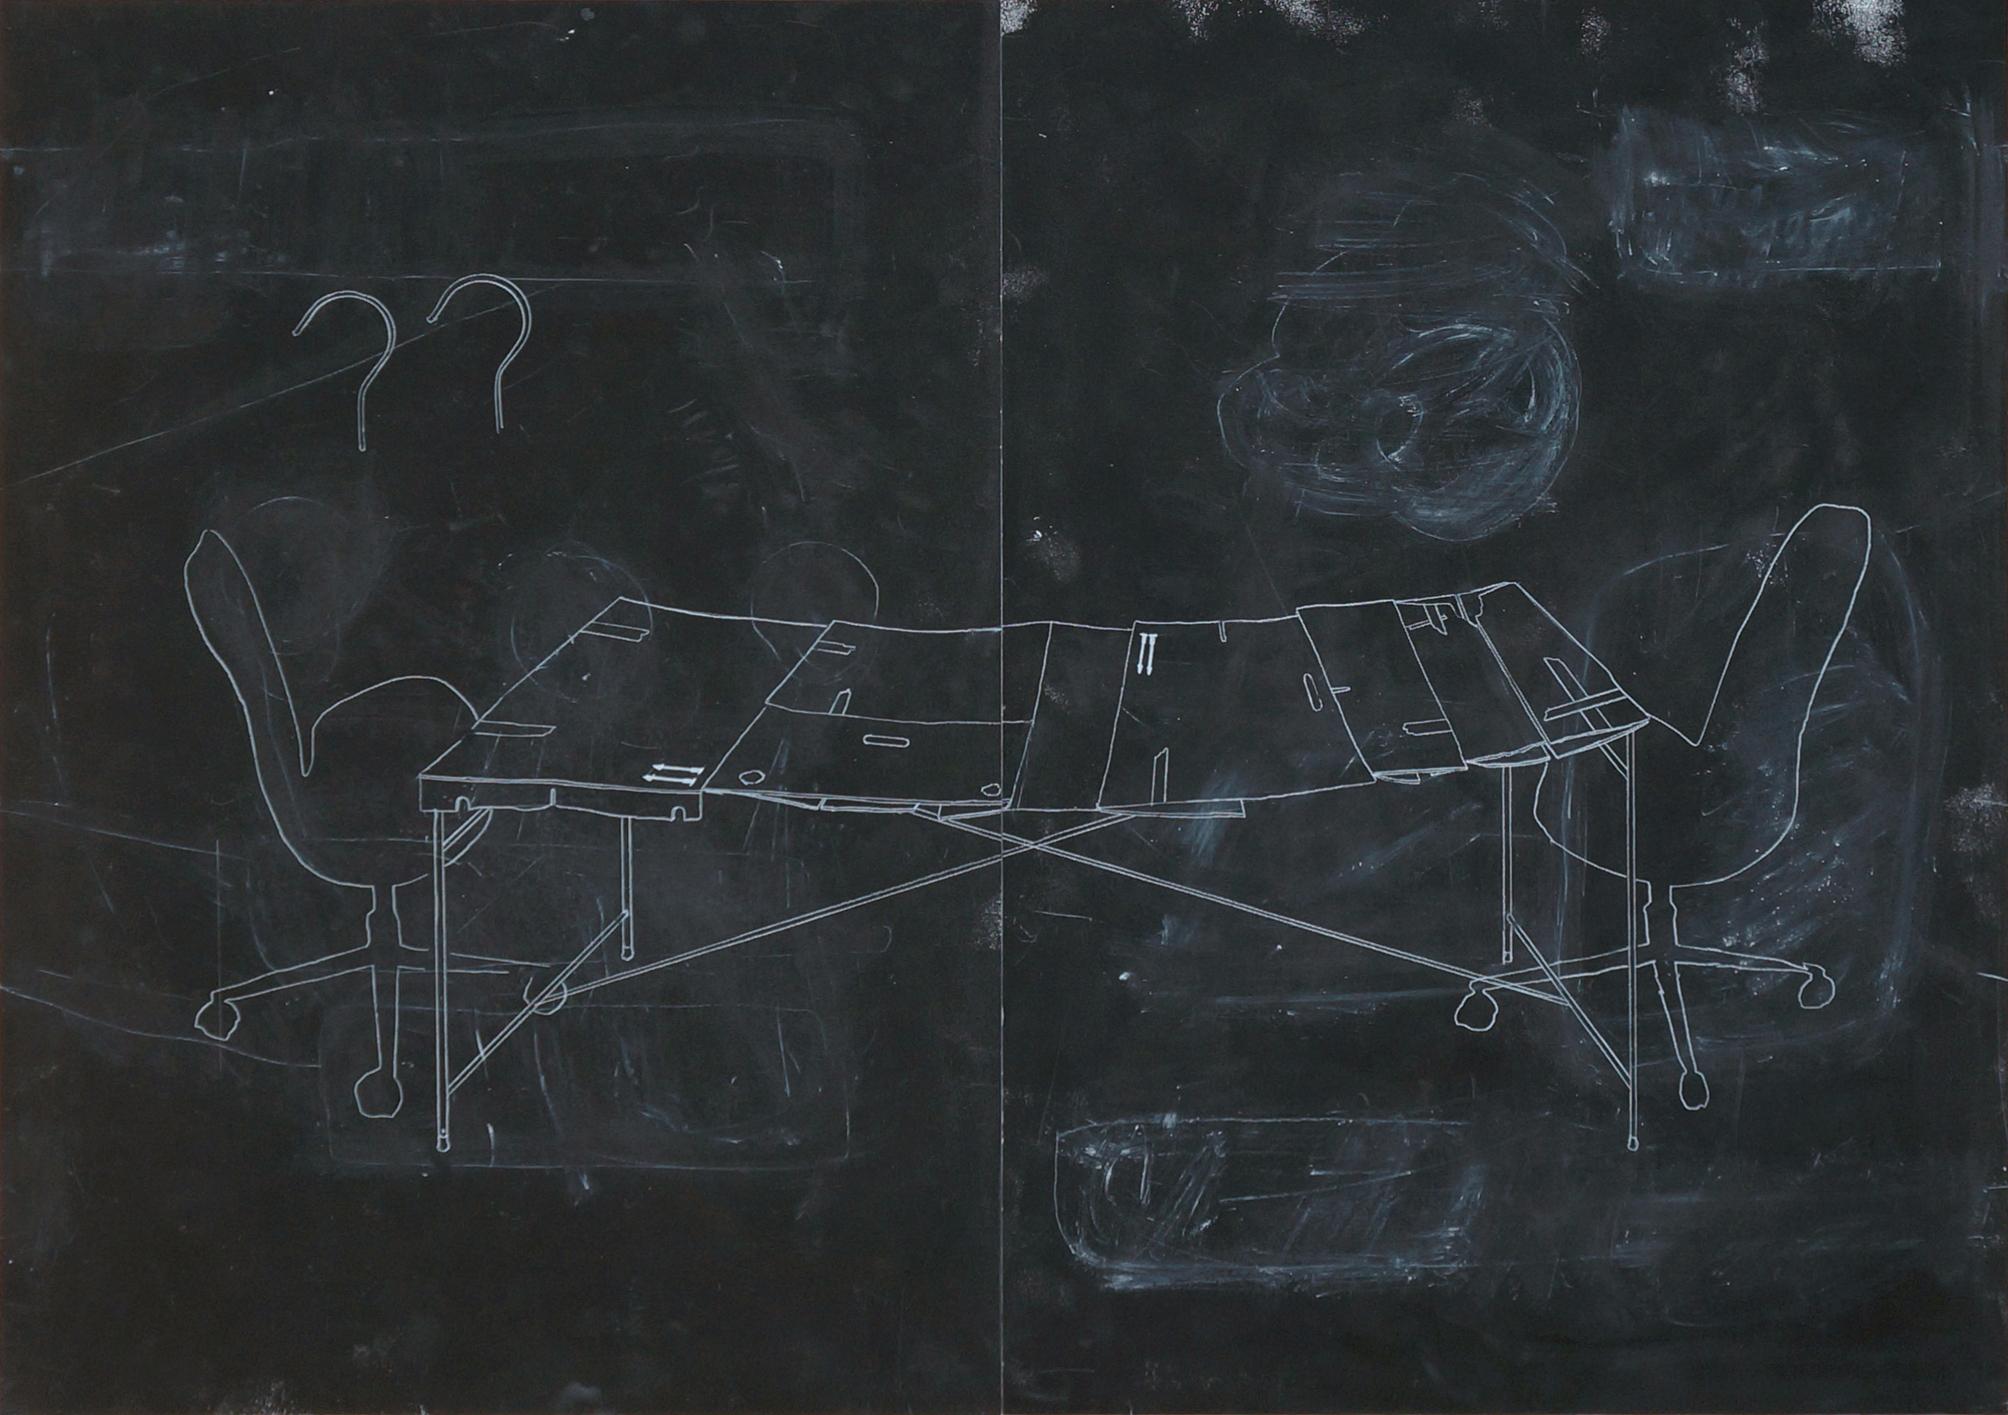 o.T. Zeichnung, 70cm x 100cm, 2017